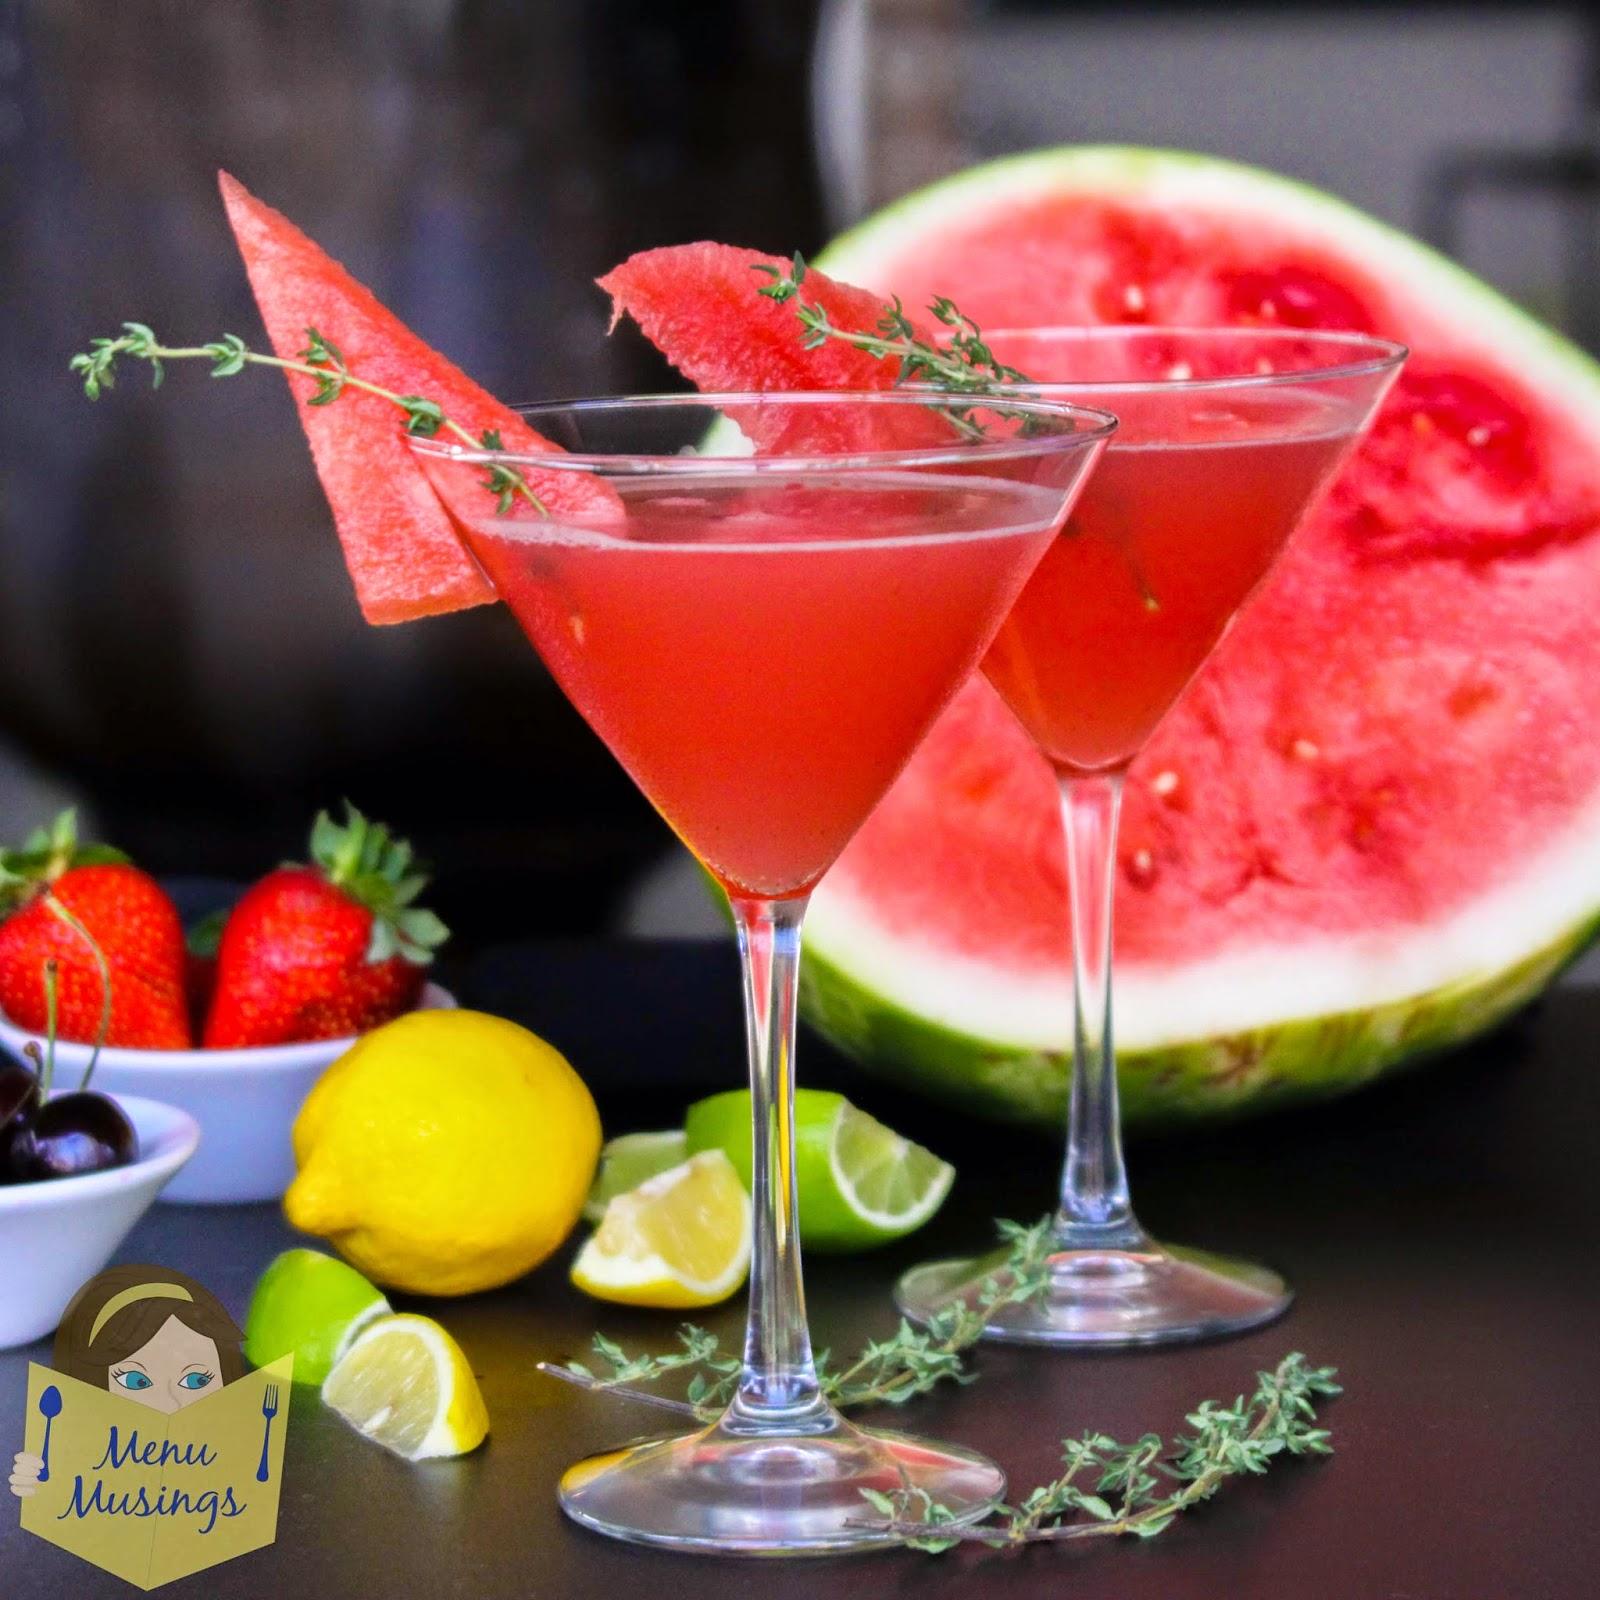 Menu Musings of a Modern American Mom: Watermelon Thyme Martini